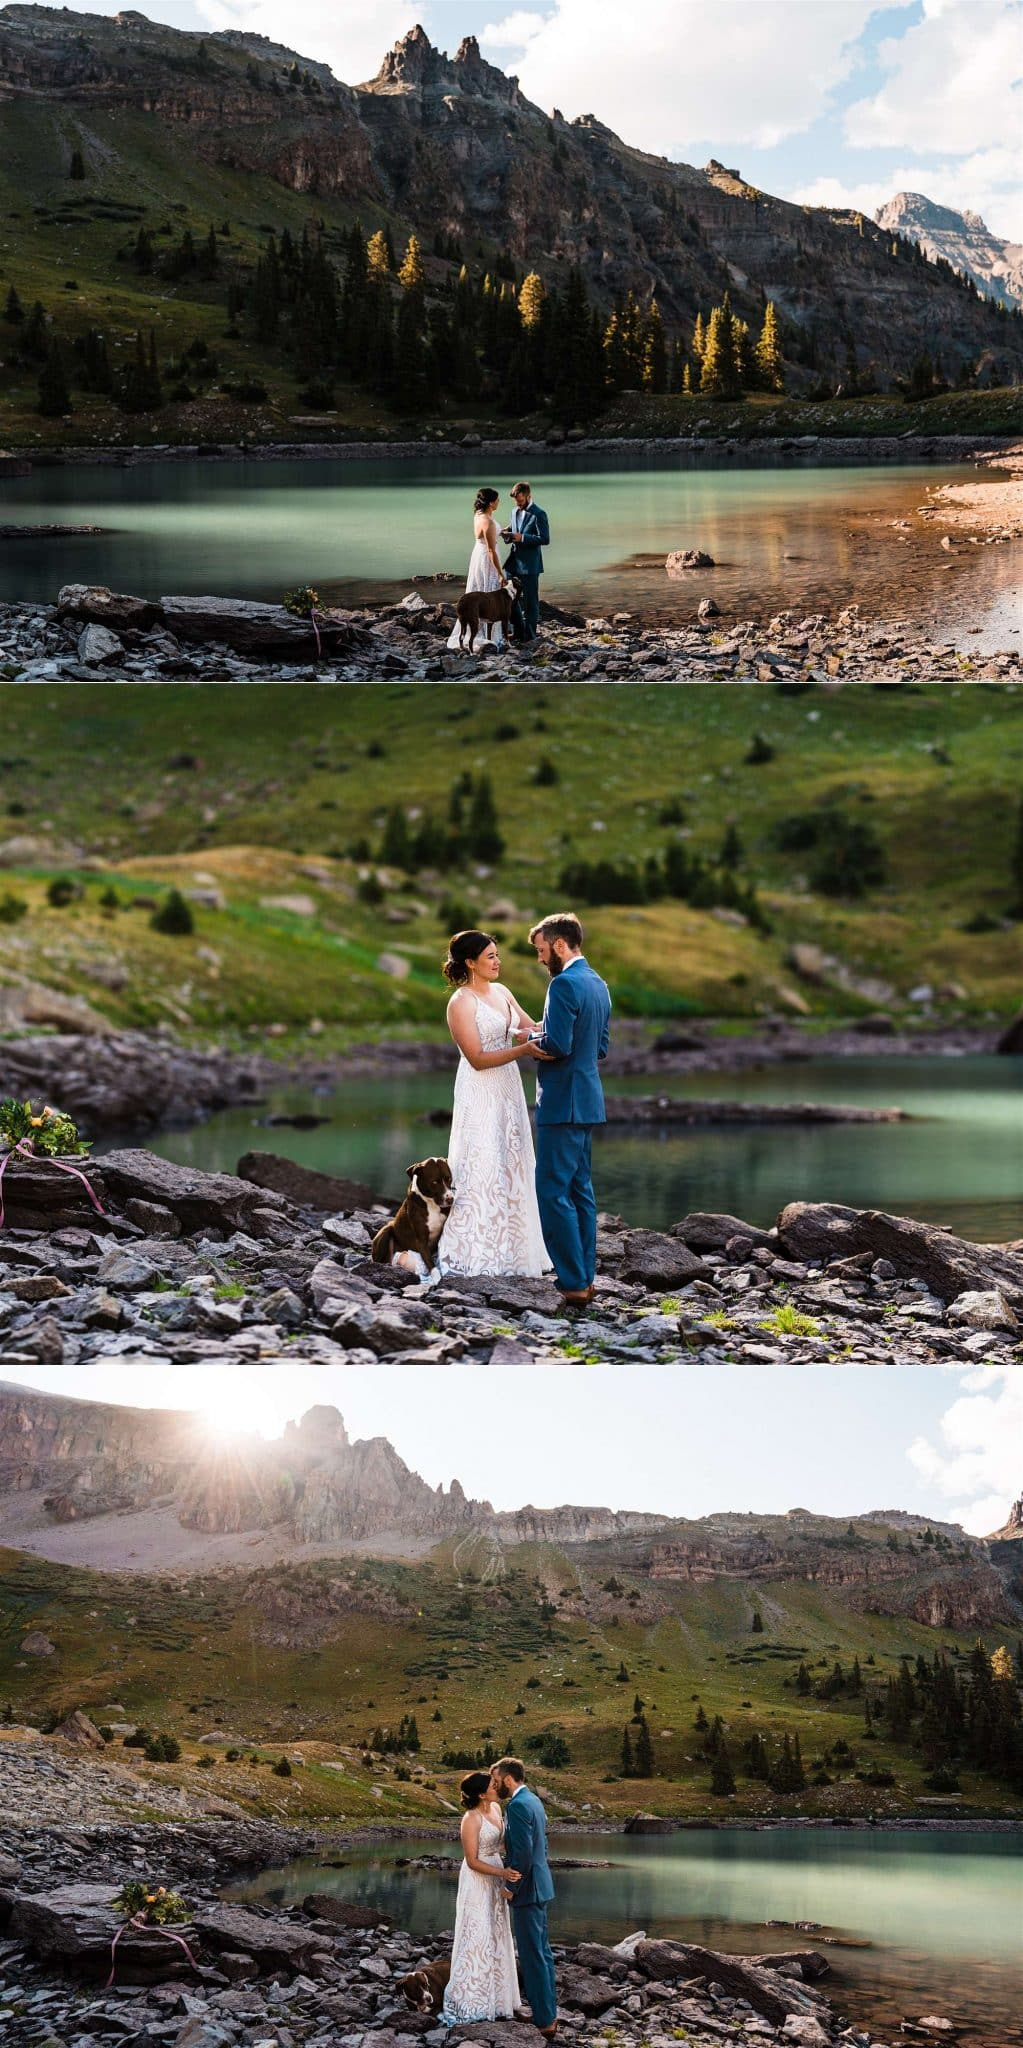 Colorado_Jeeping_Elopement_Emily_Matt_The_Foxes_Photography_0032.jpg